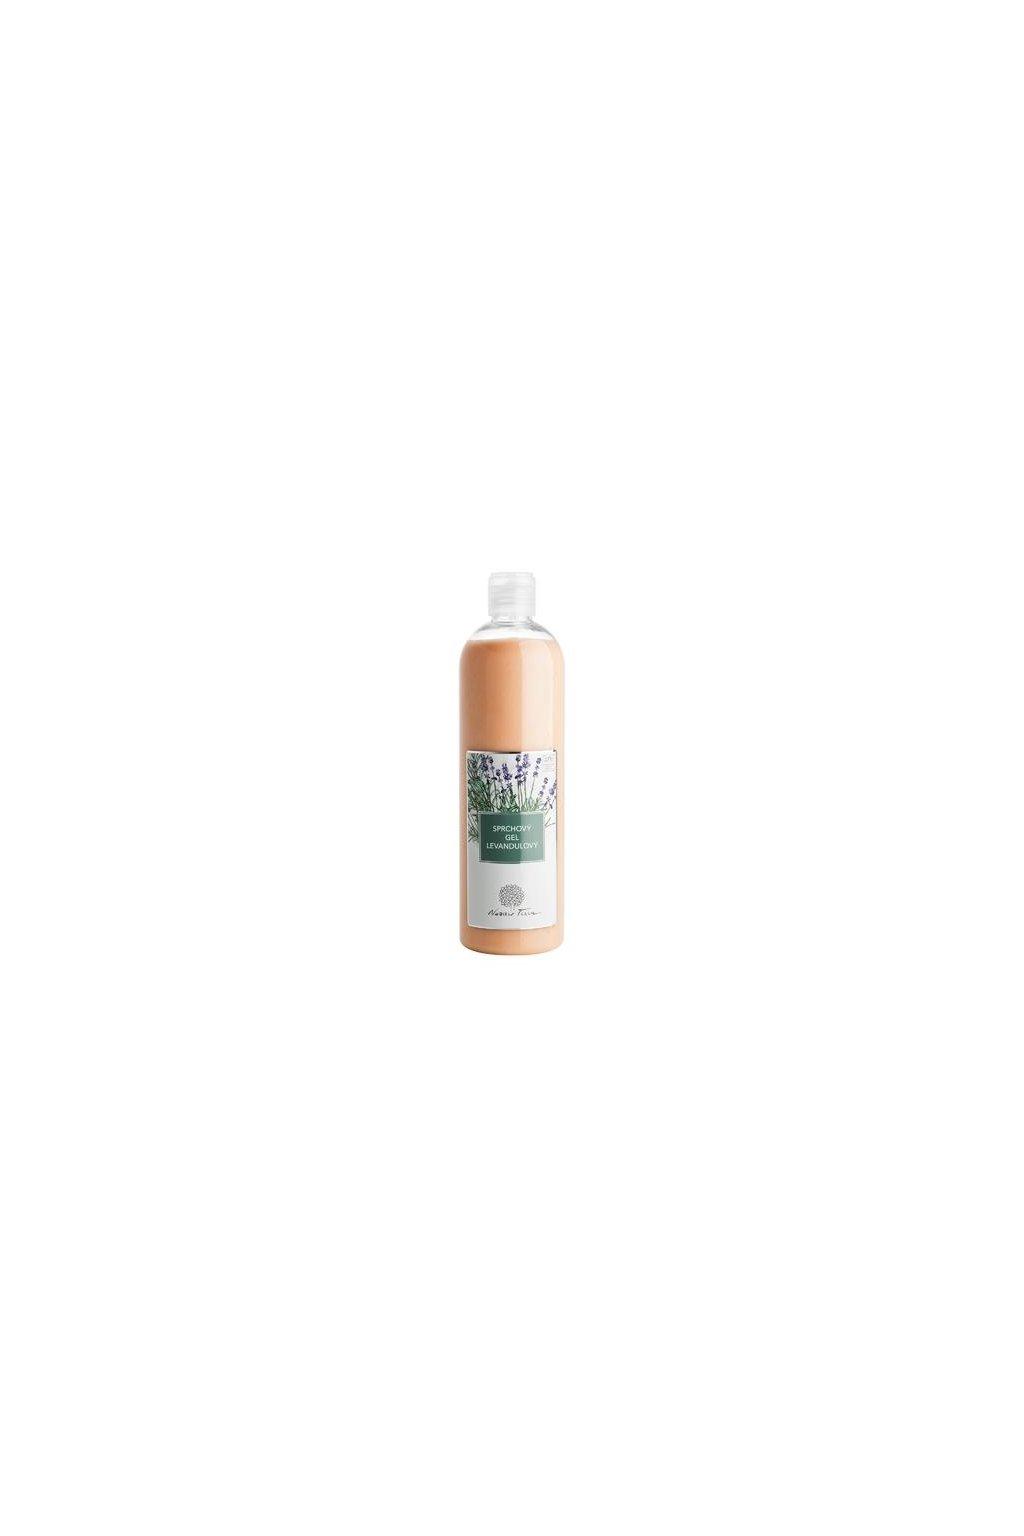 10589 nobilis tilia sprchovy gel levandulovy 500 ml